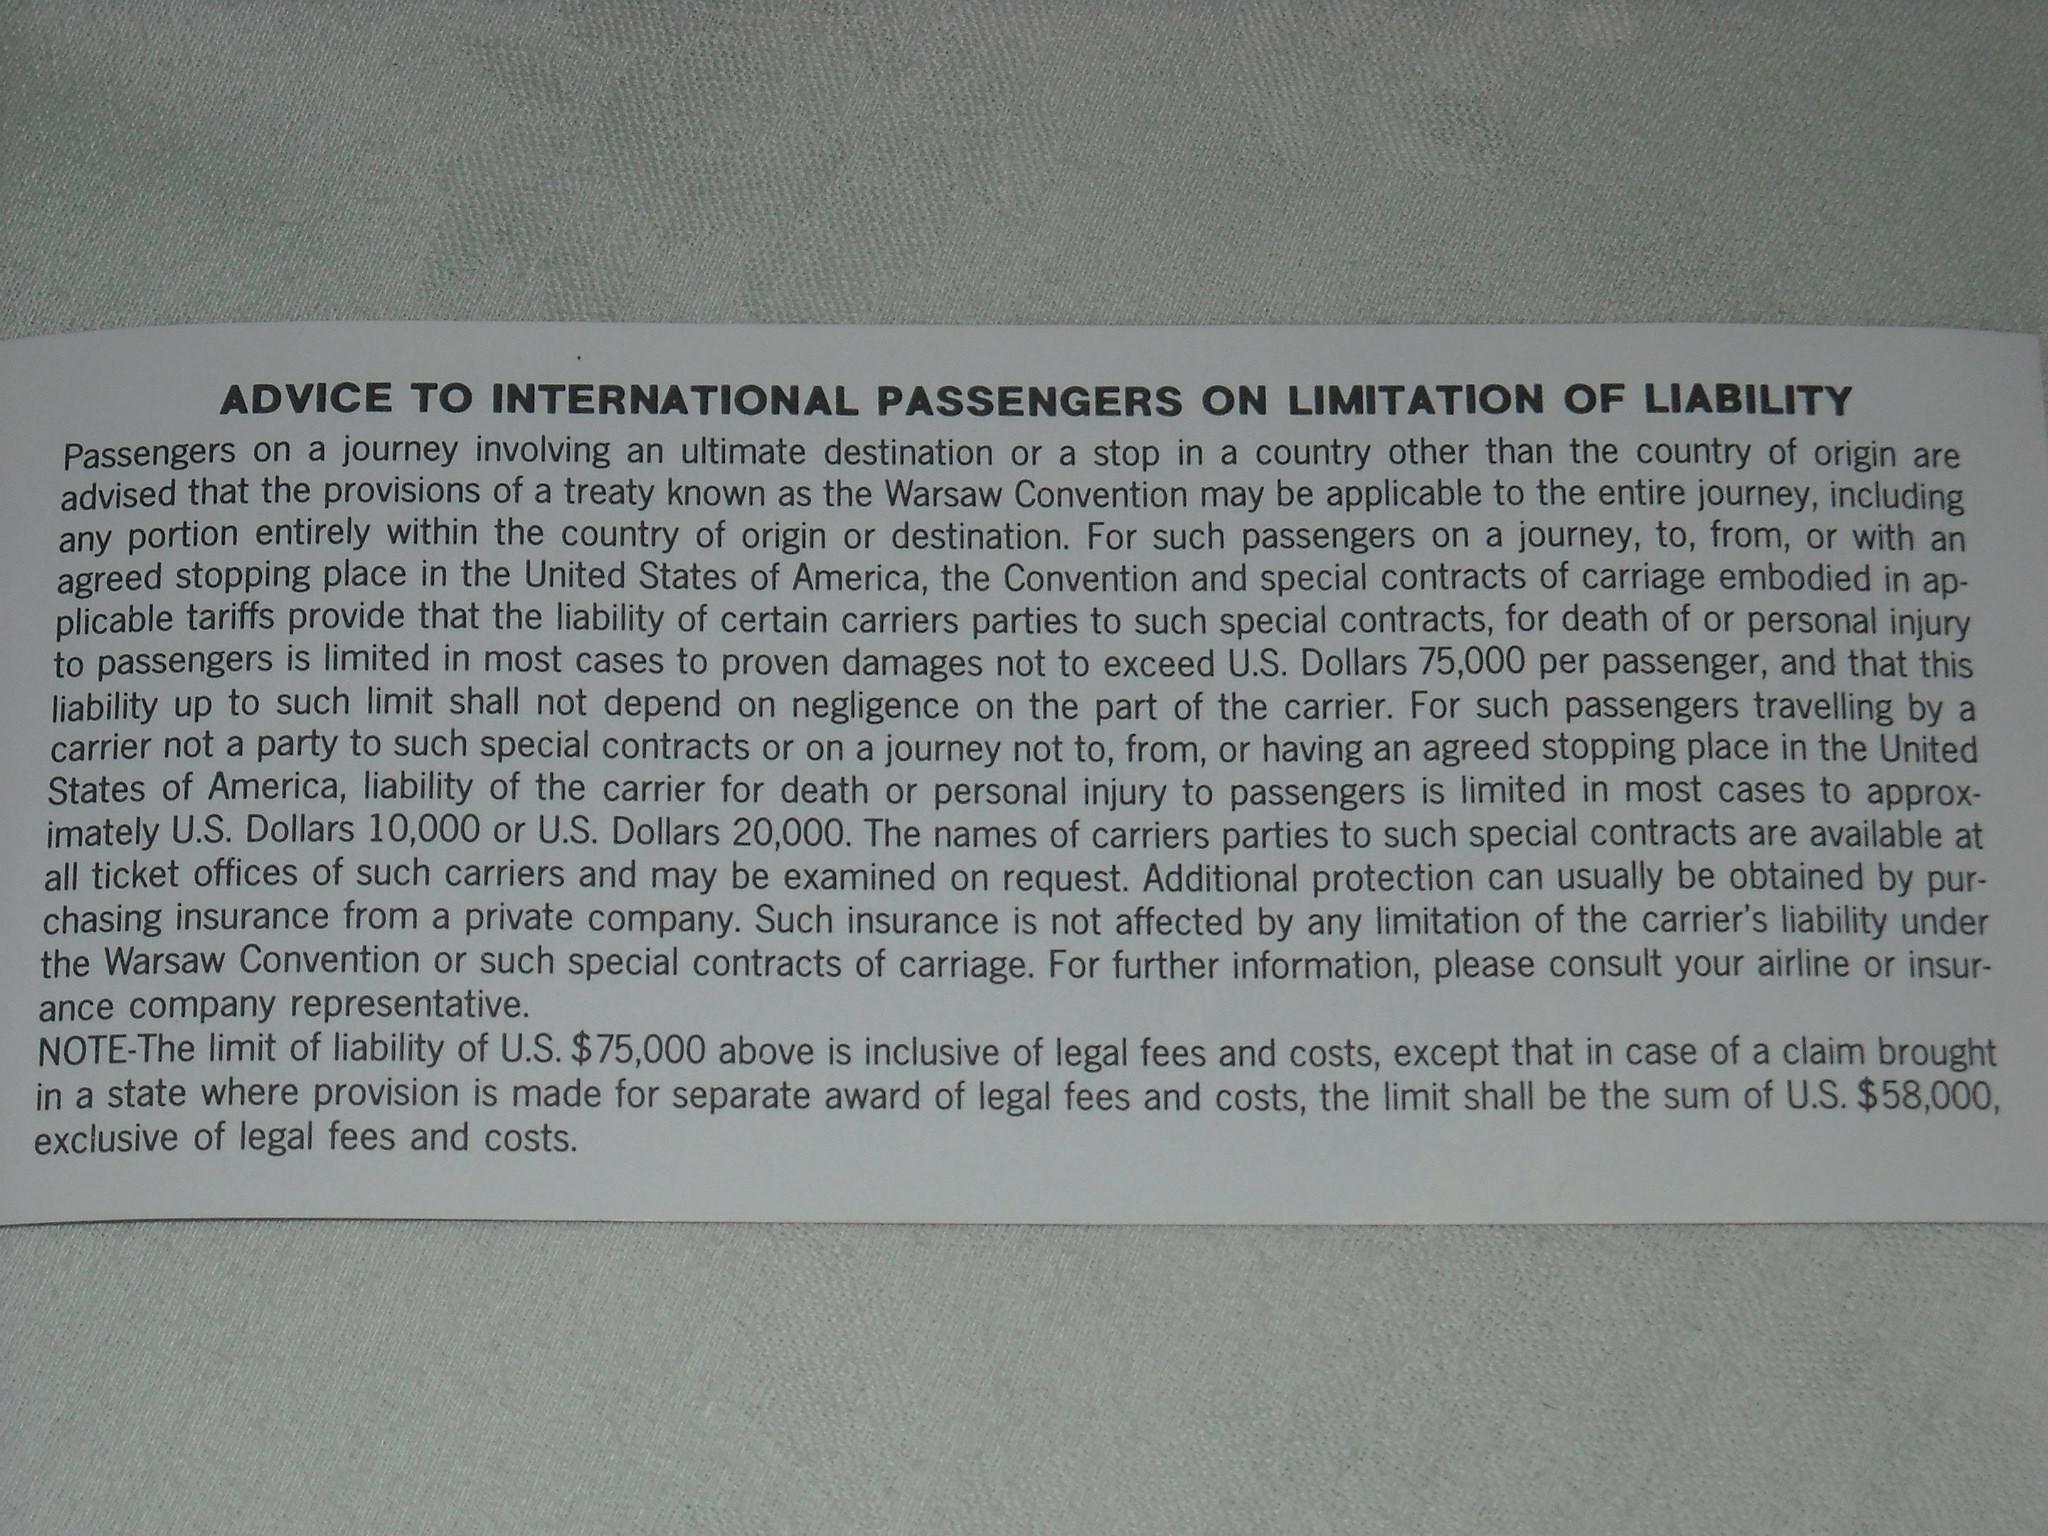 o2のとほほ -Blog-赤いカーボン複写の航空チケットコメントトラックバック